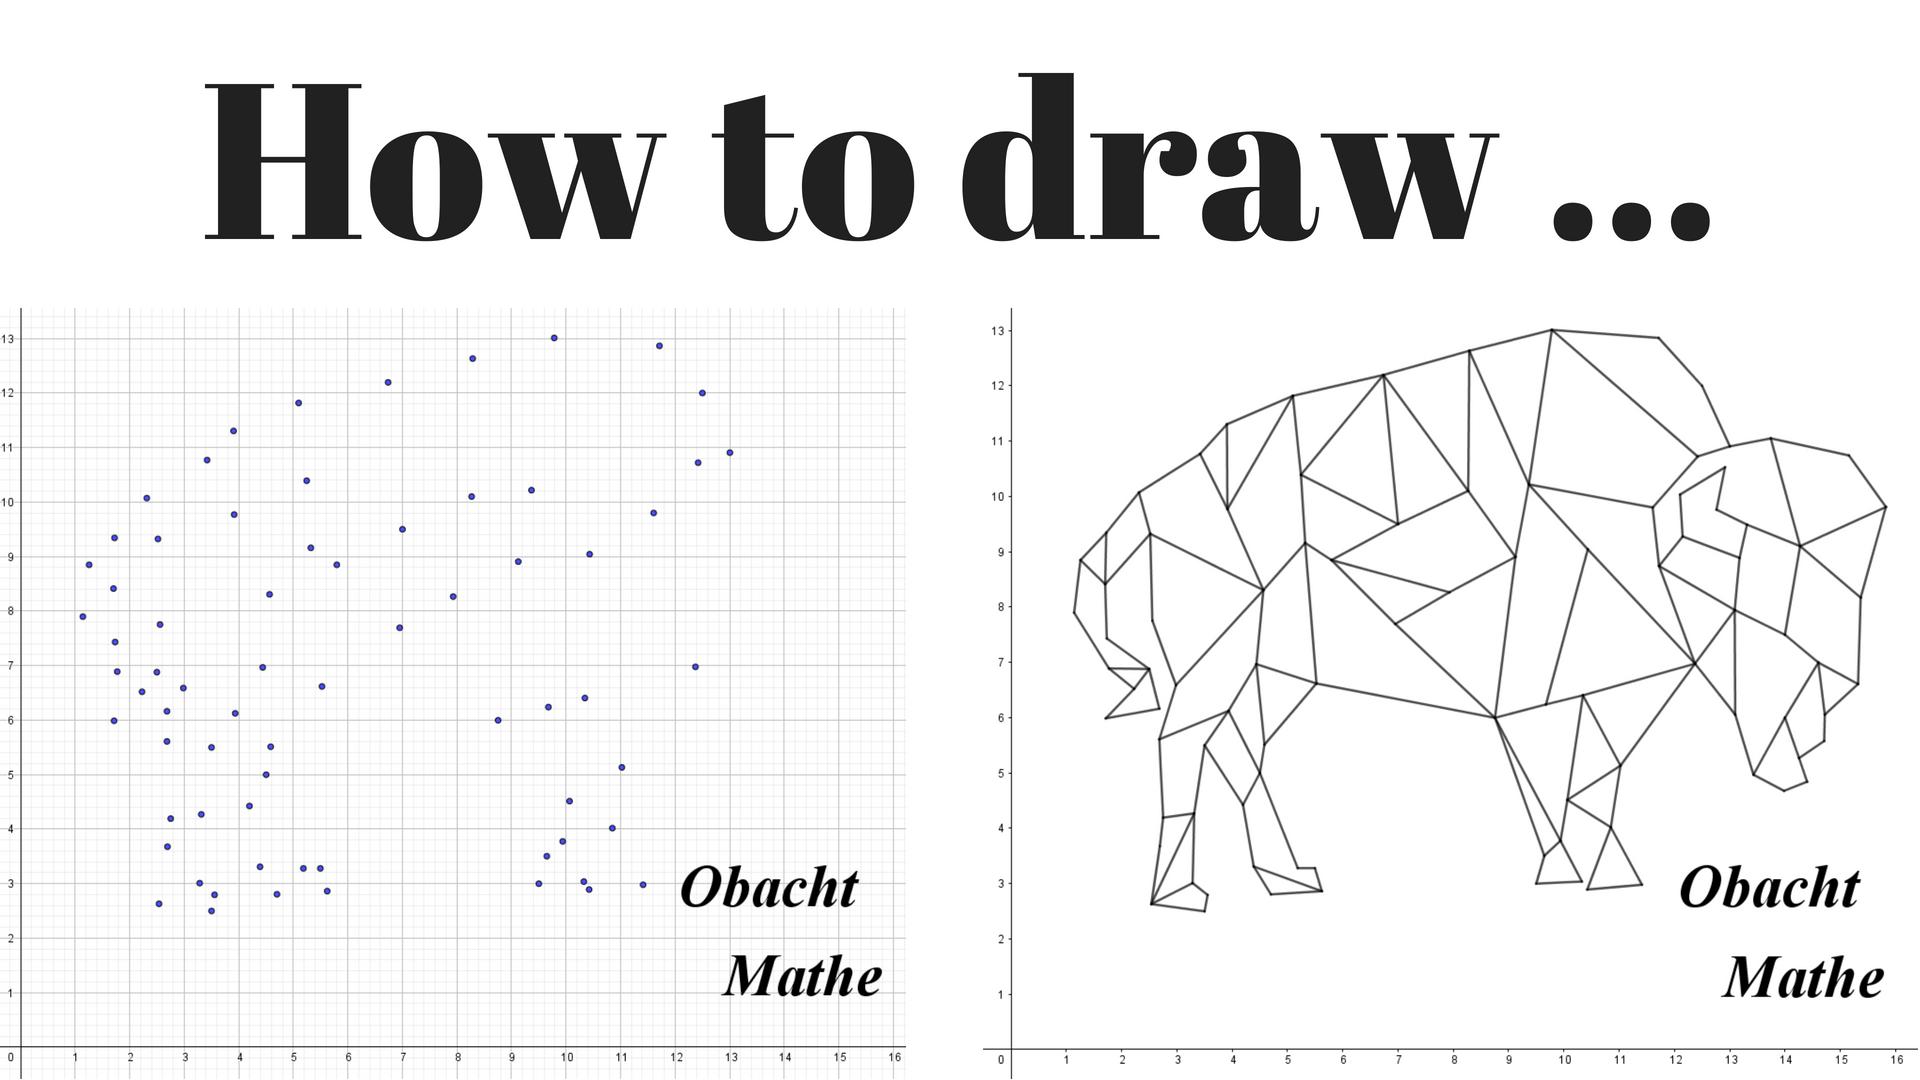 How To Draw A Buffalo Geometric Wie Zeichnet Man Einen Buffel Geometrisch Paint By Numbers Malen Nac Malen Nach Zahlen Geometrisch Geometrisches Tier